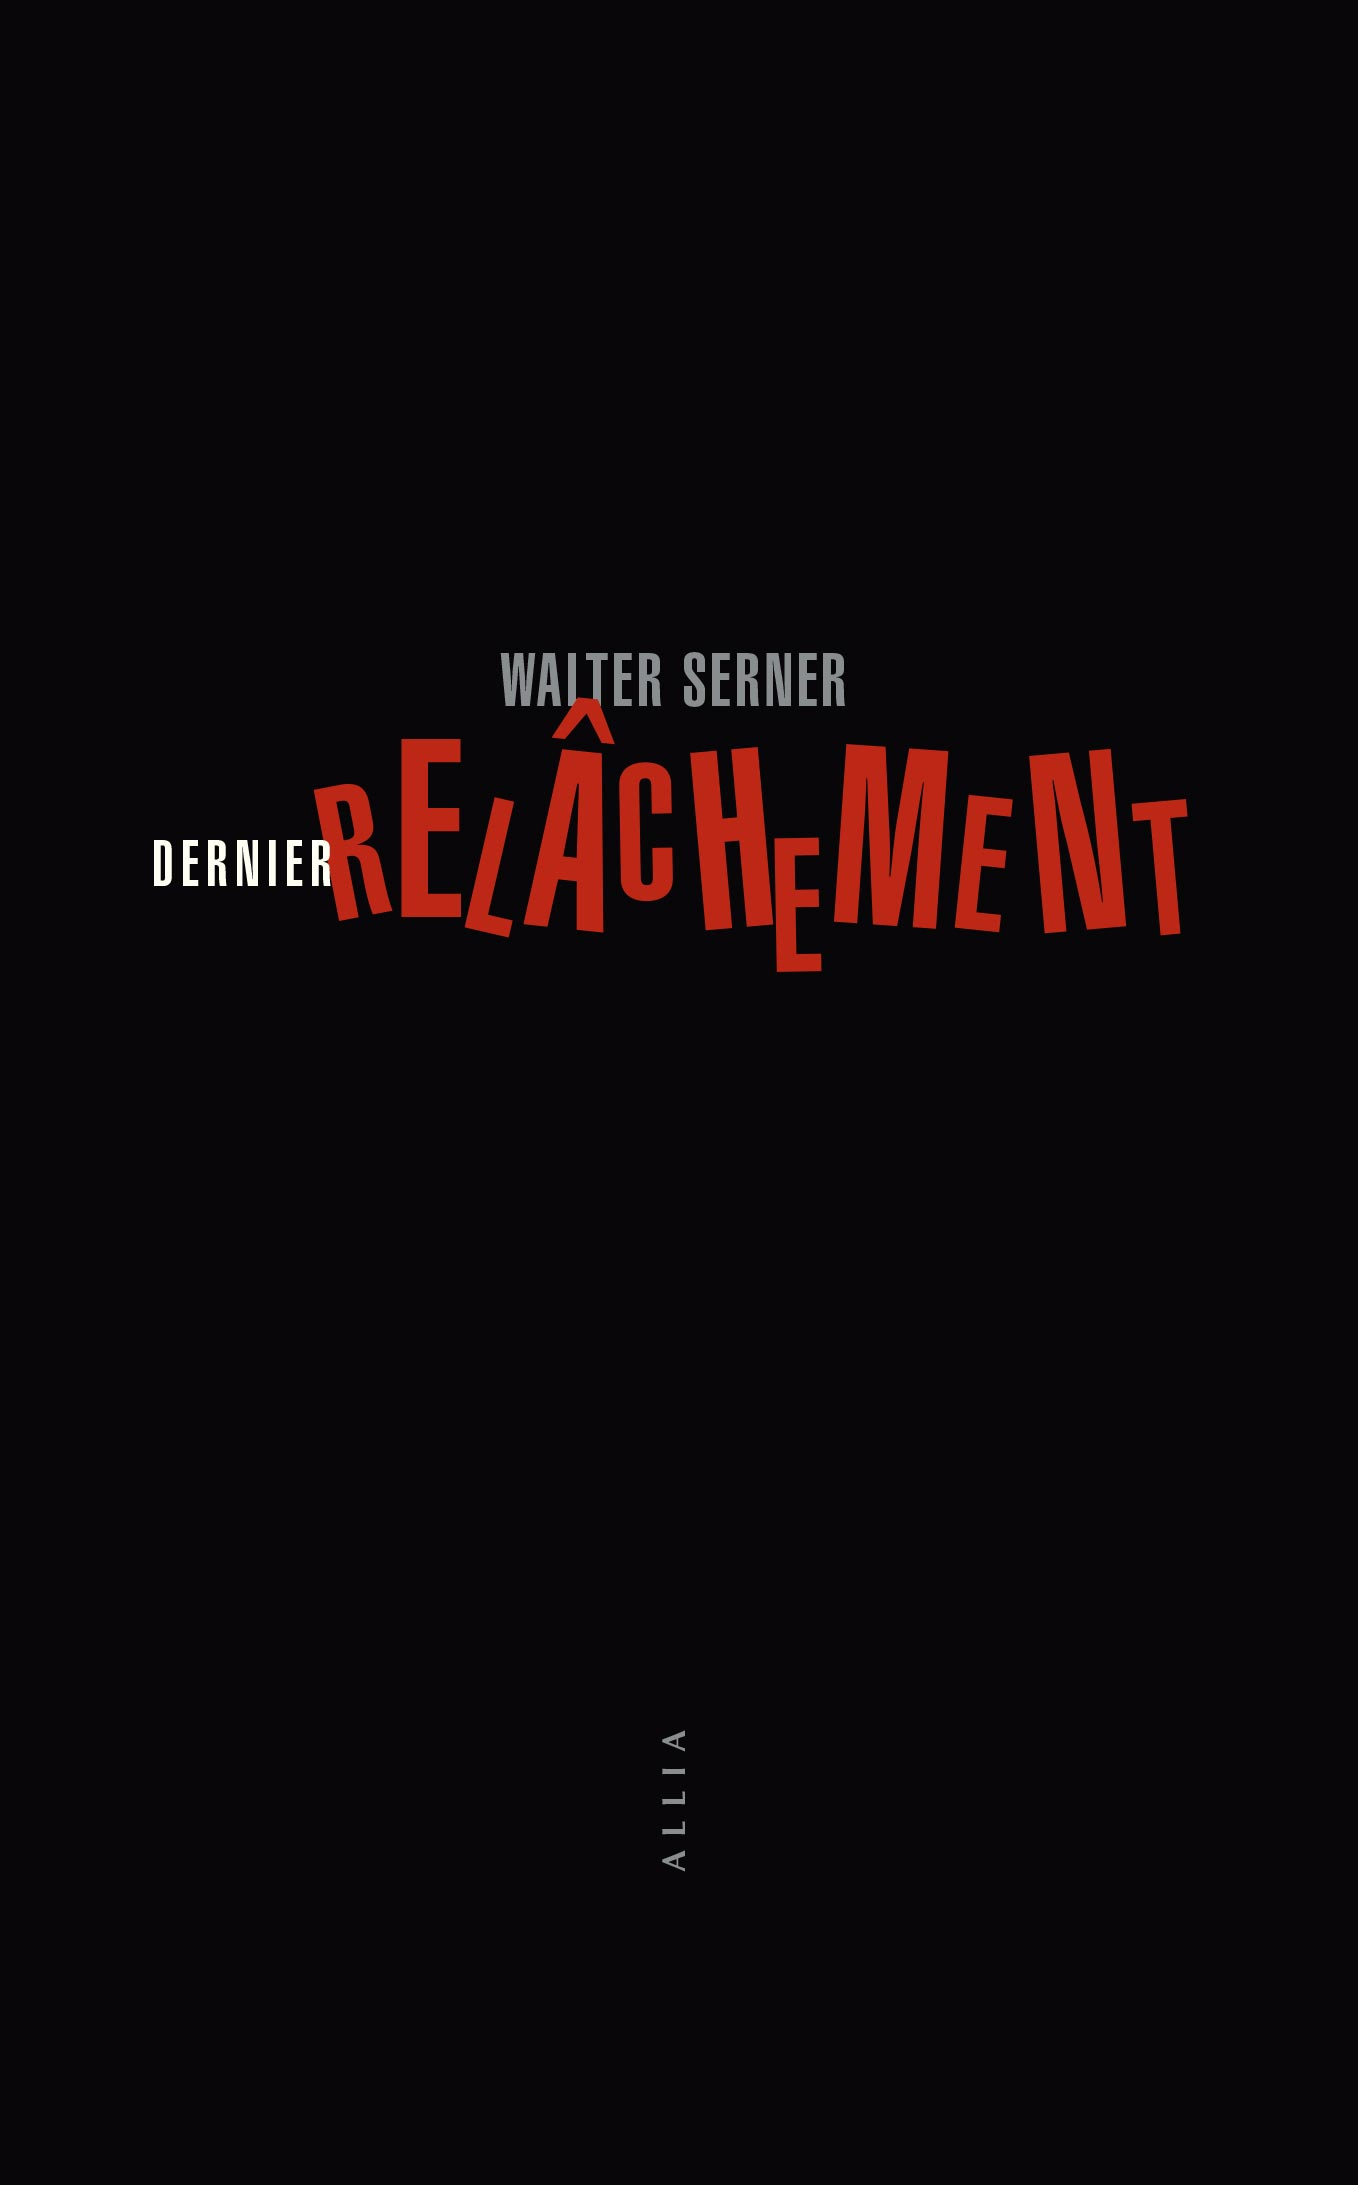 W. Serner, Dernier relâchement (trad. C. Wermester)